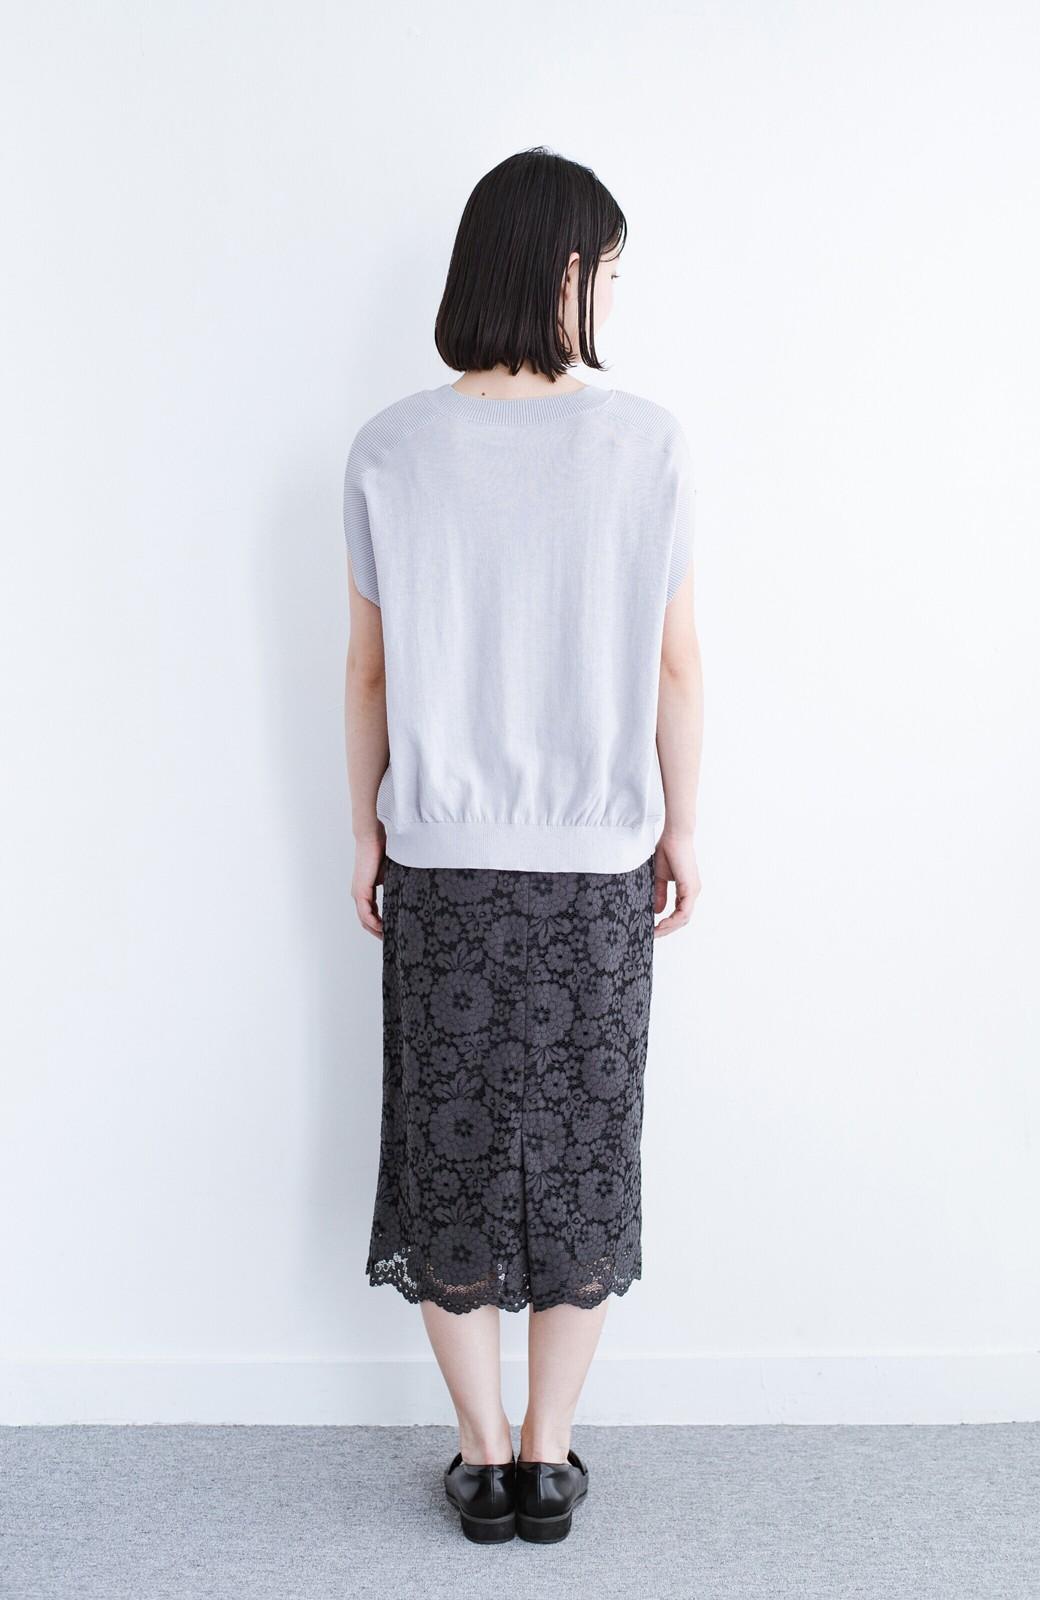 haco! カットソー感覚で着られる 洗えるオトナニットトップス by MAKORI <ライトグレー>の商品写真11